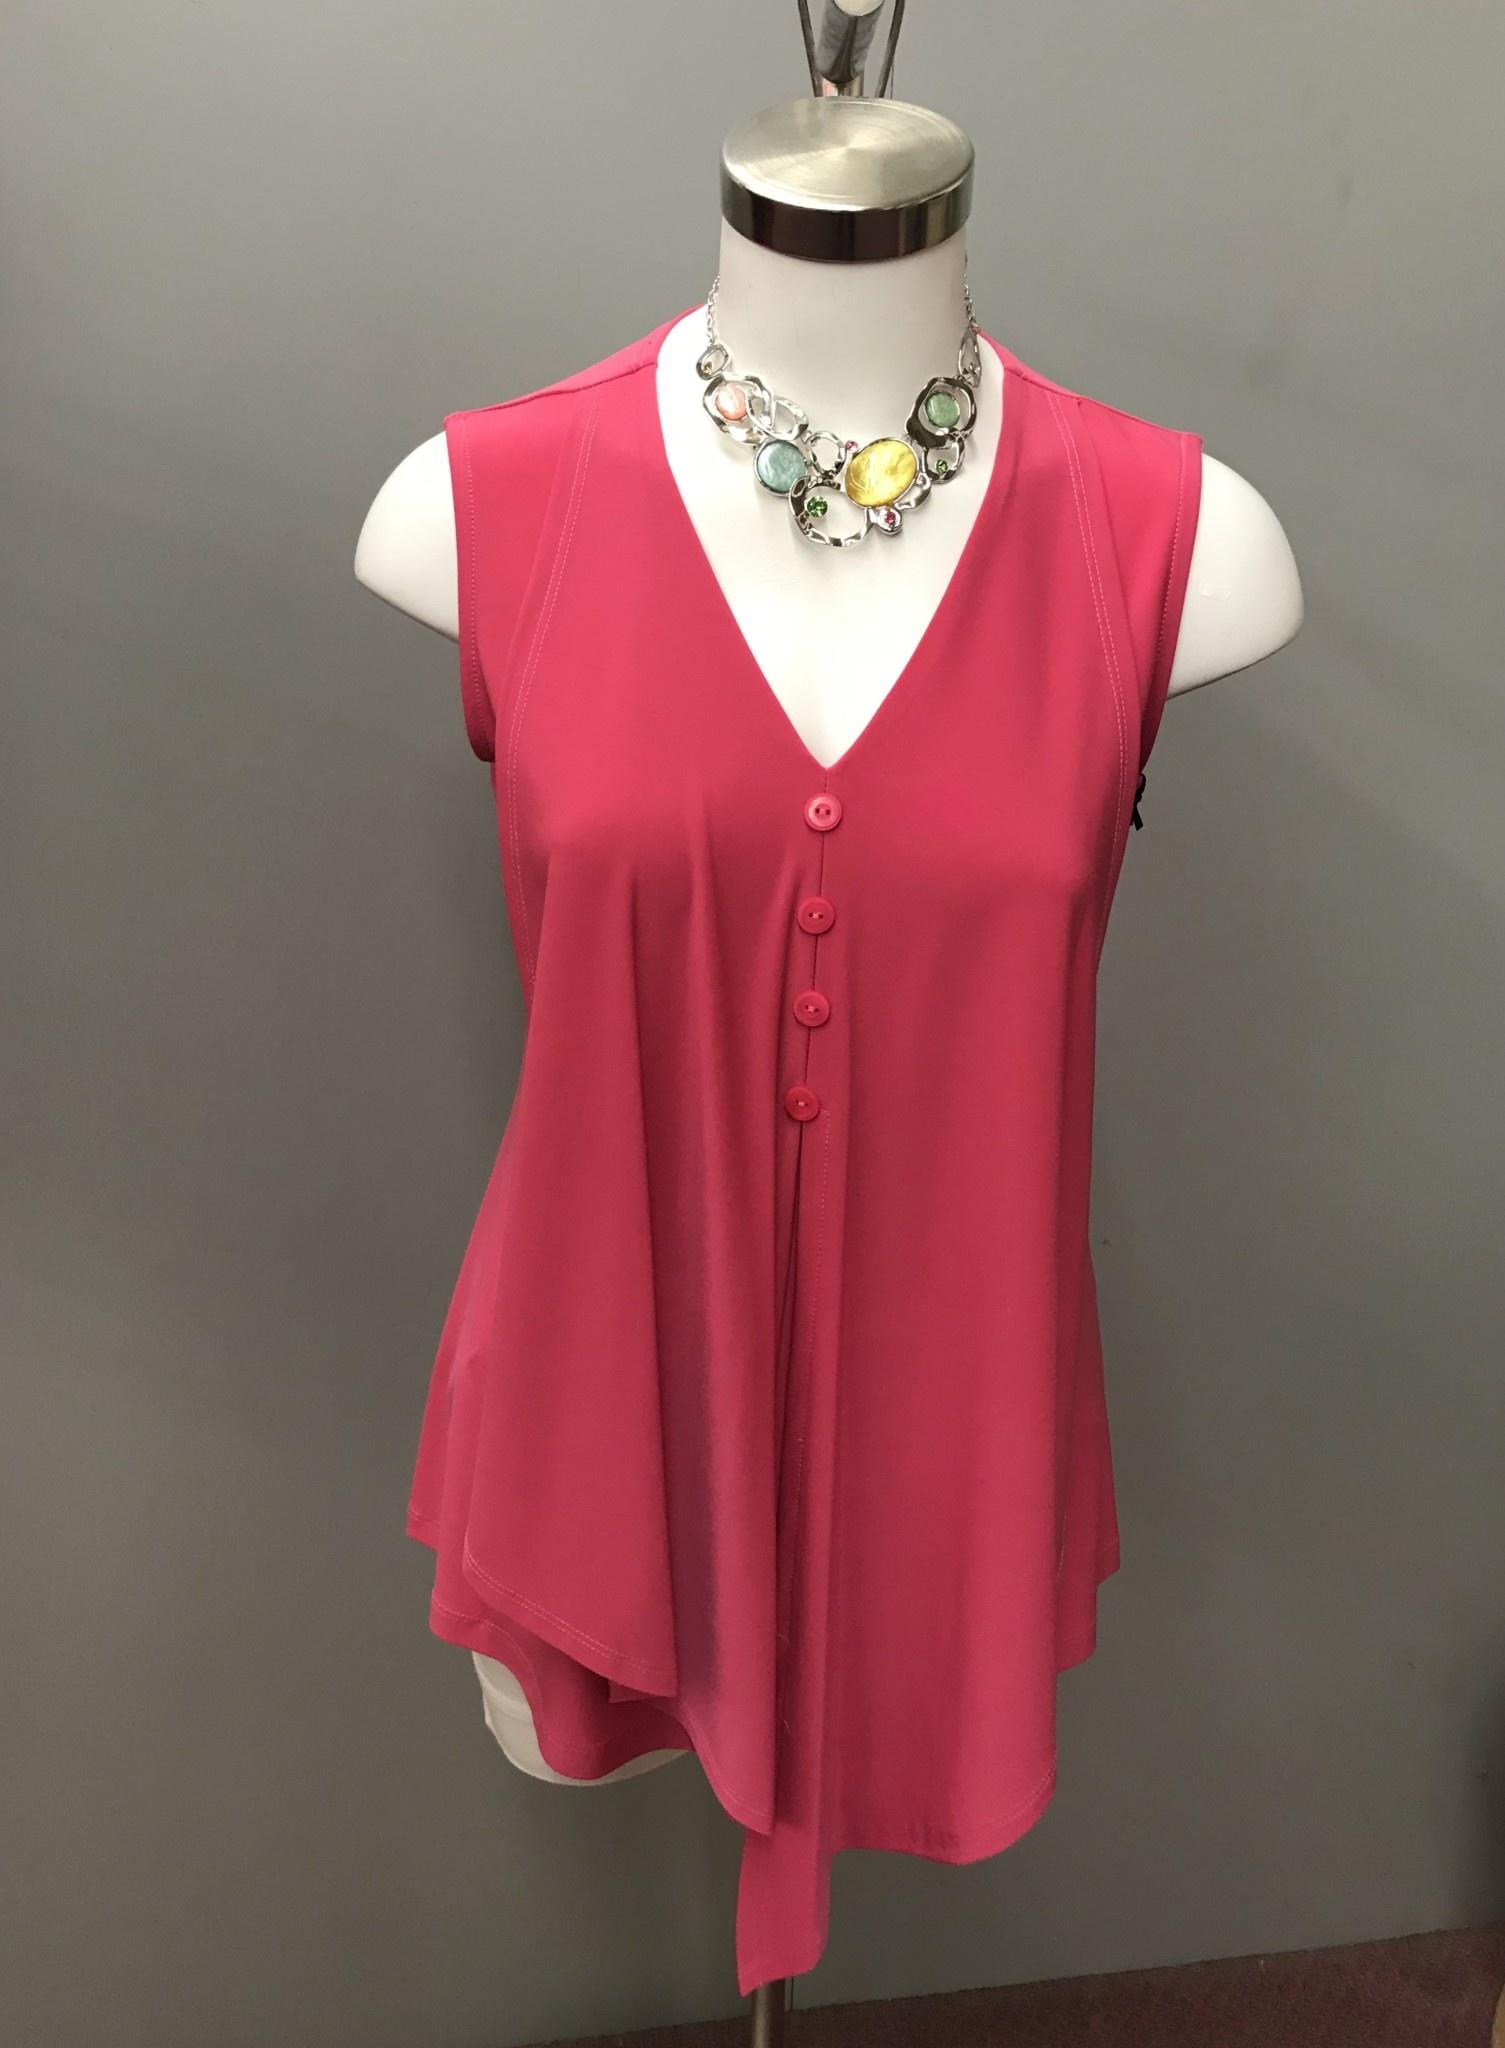 Artex Fashions Flamingo Print Tank Top